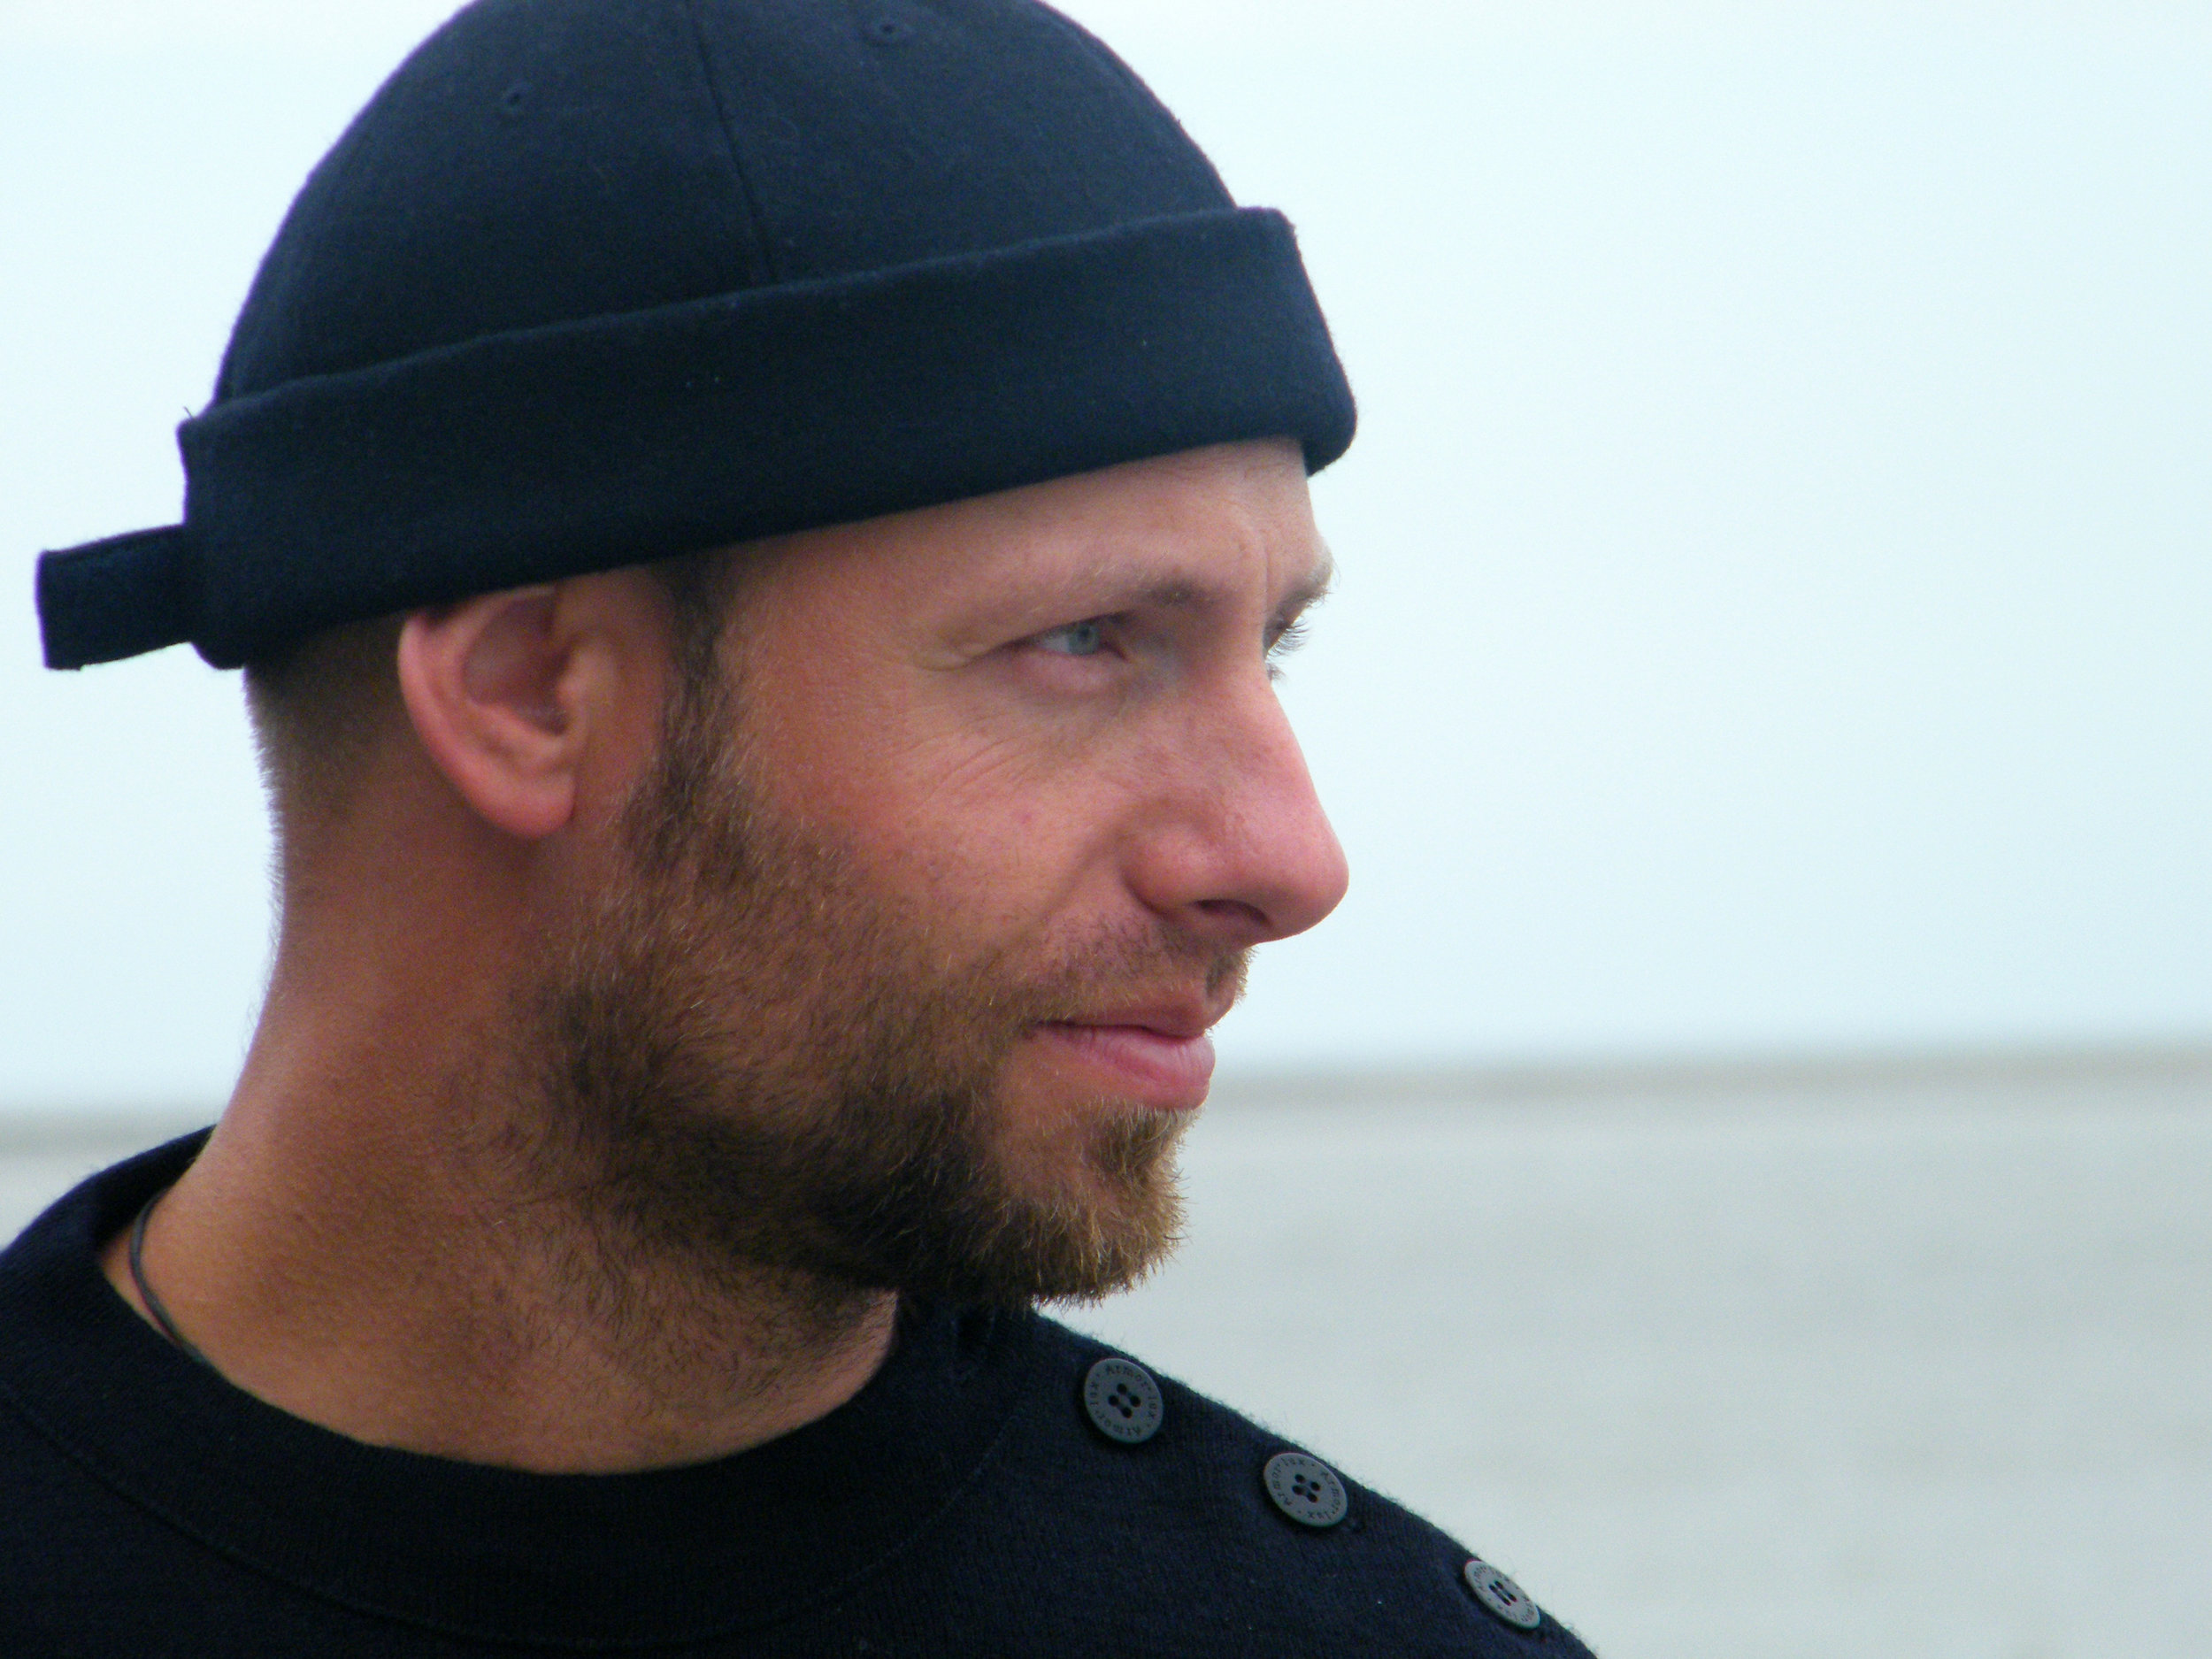 Markus Magenheims